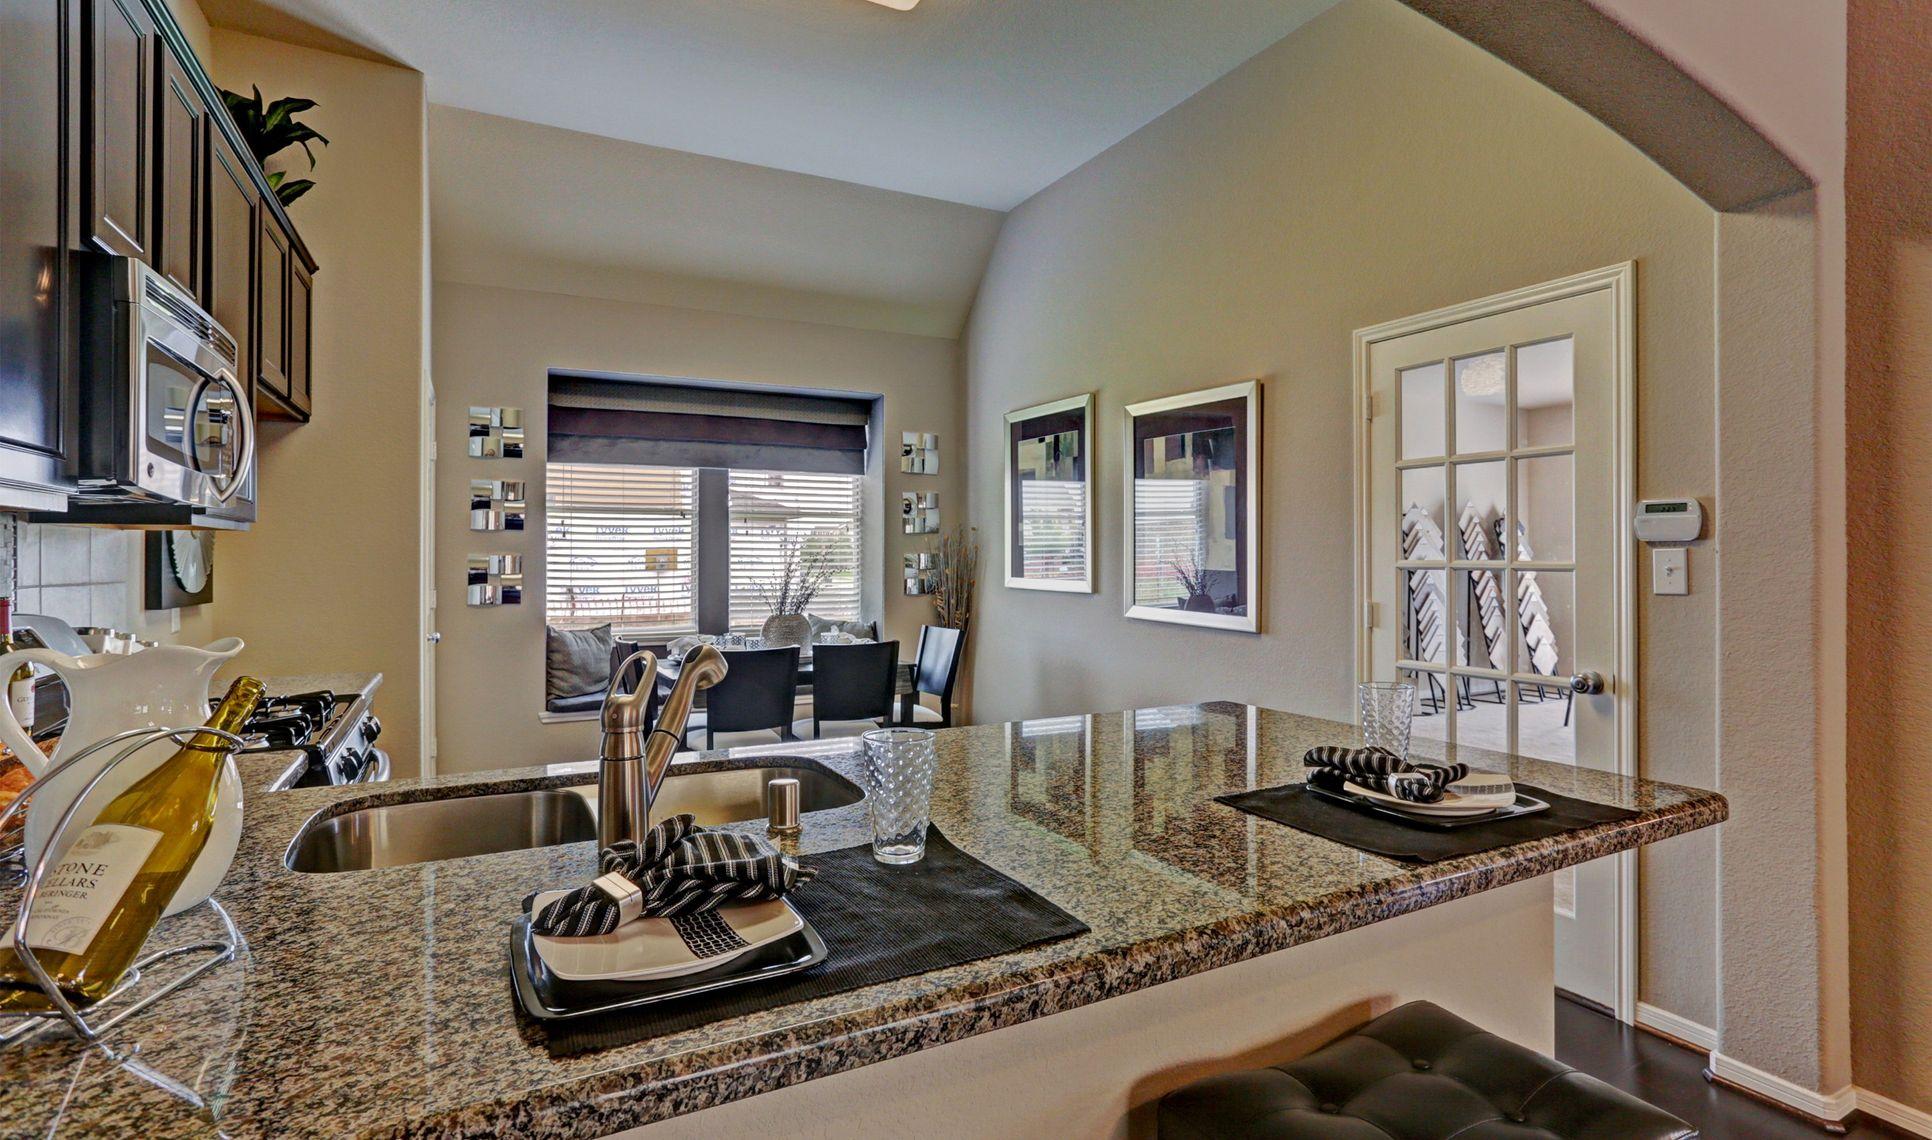 Interior:Stylish kitchen with dining area